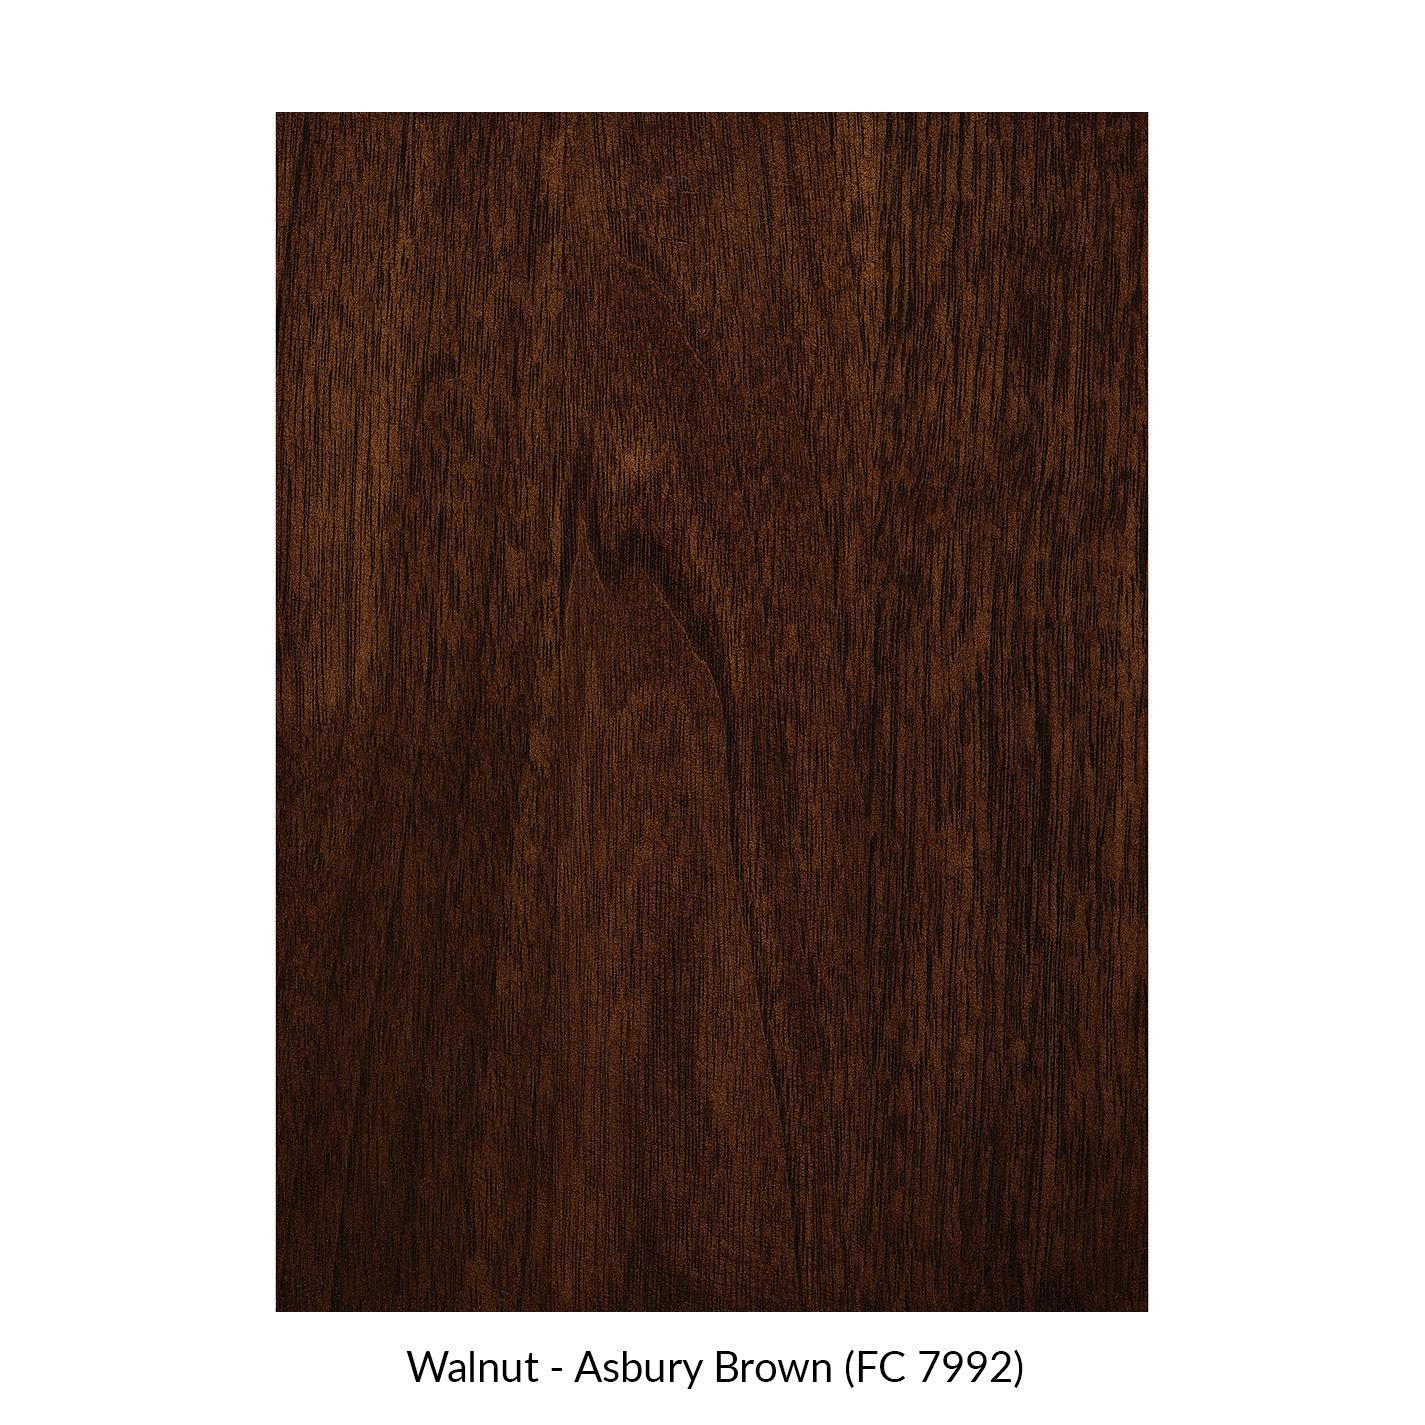 spectrum-walnut-asbury-brown-fc-7992.jpg